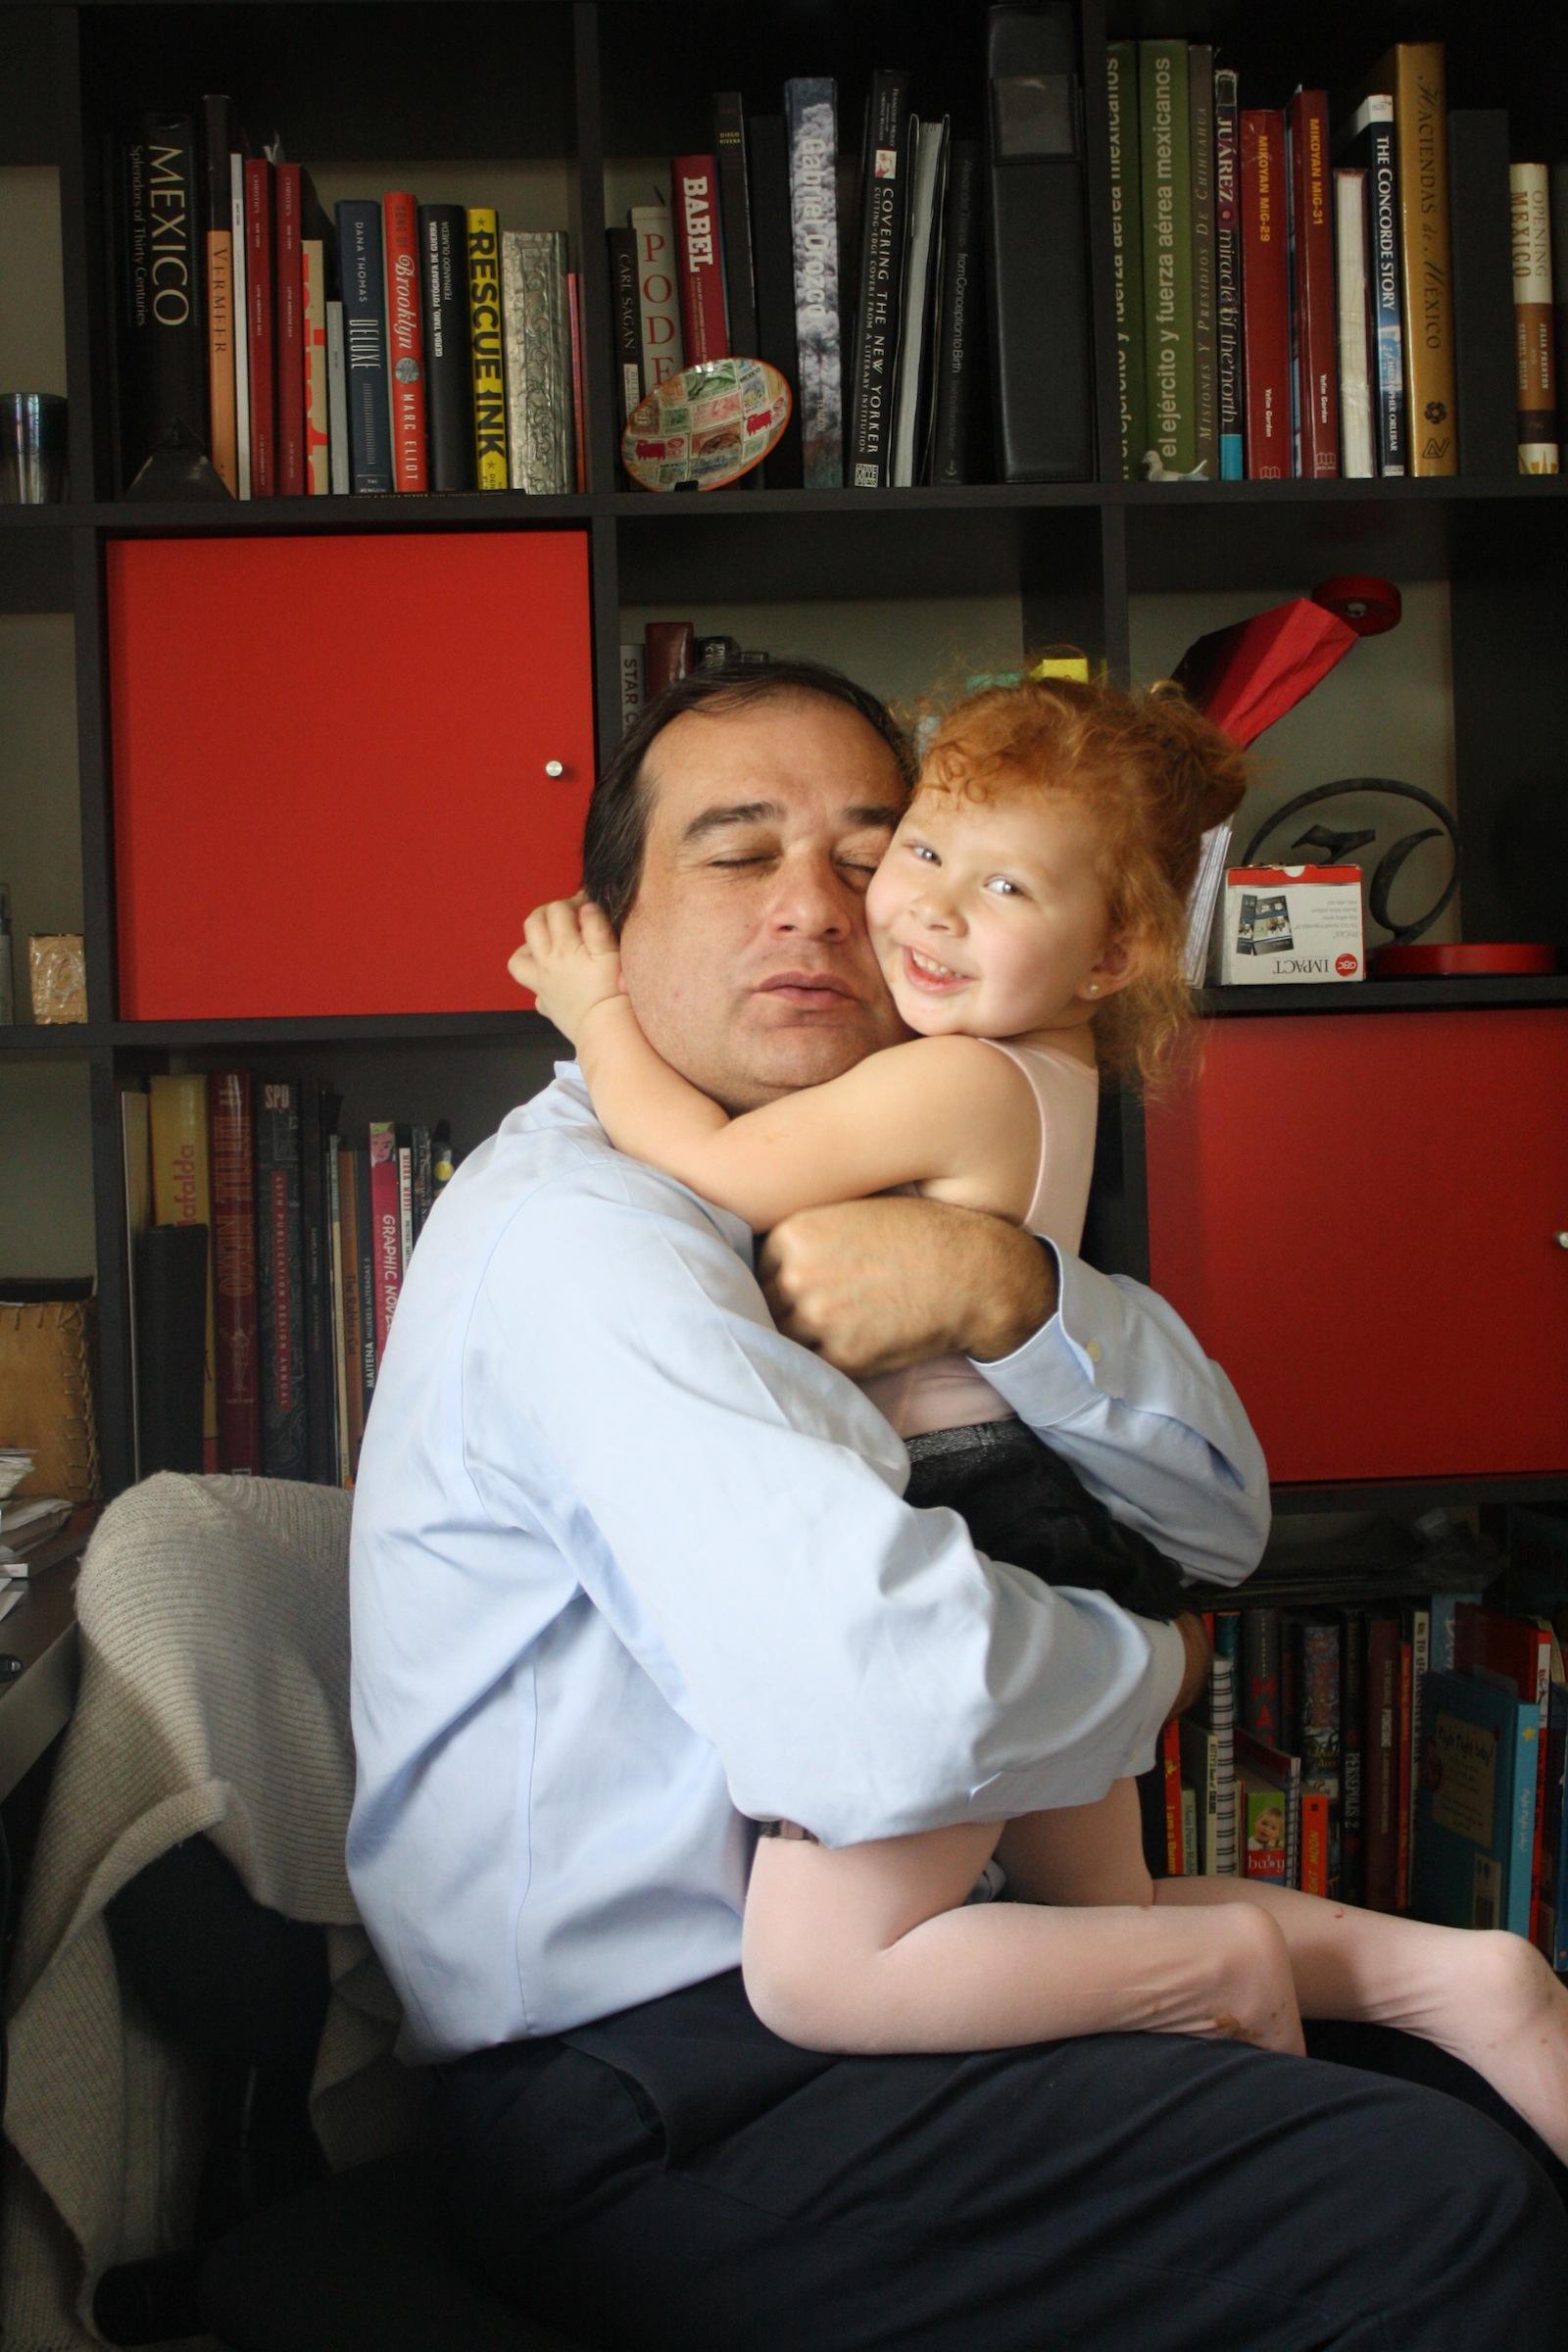 Papi y Cristina en pleno abrazo.